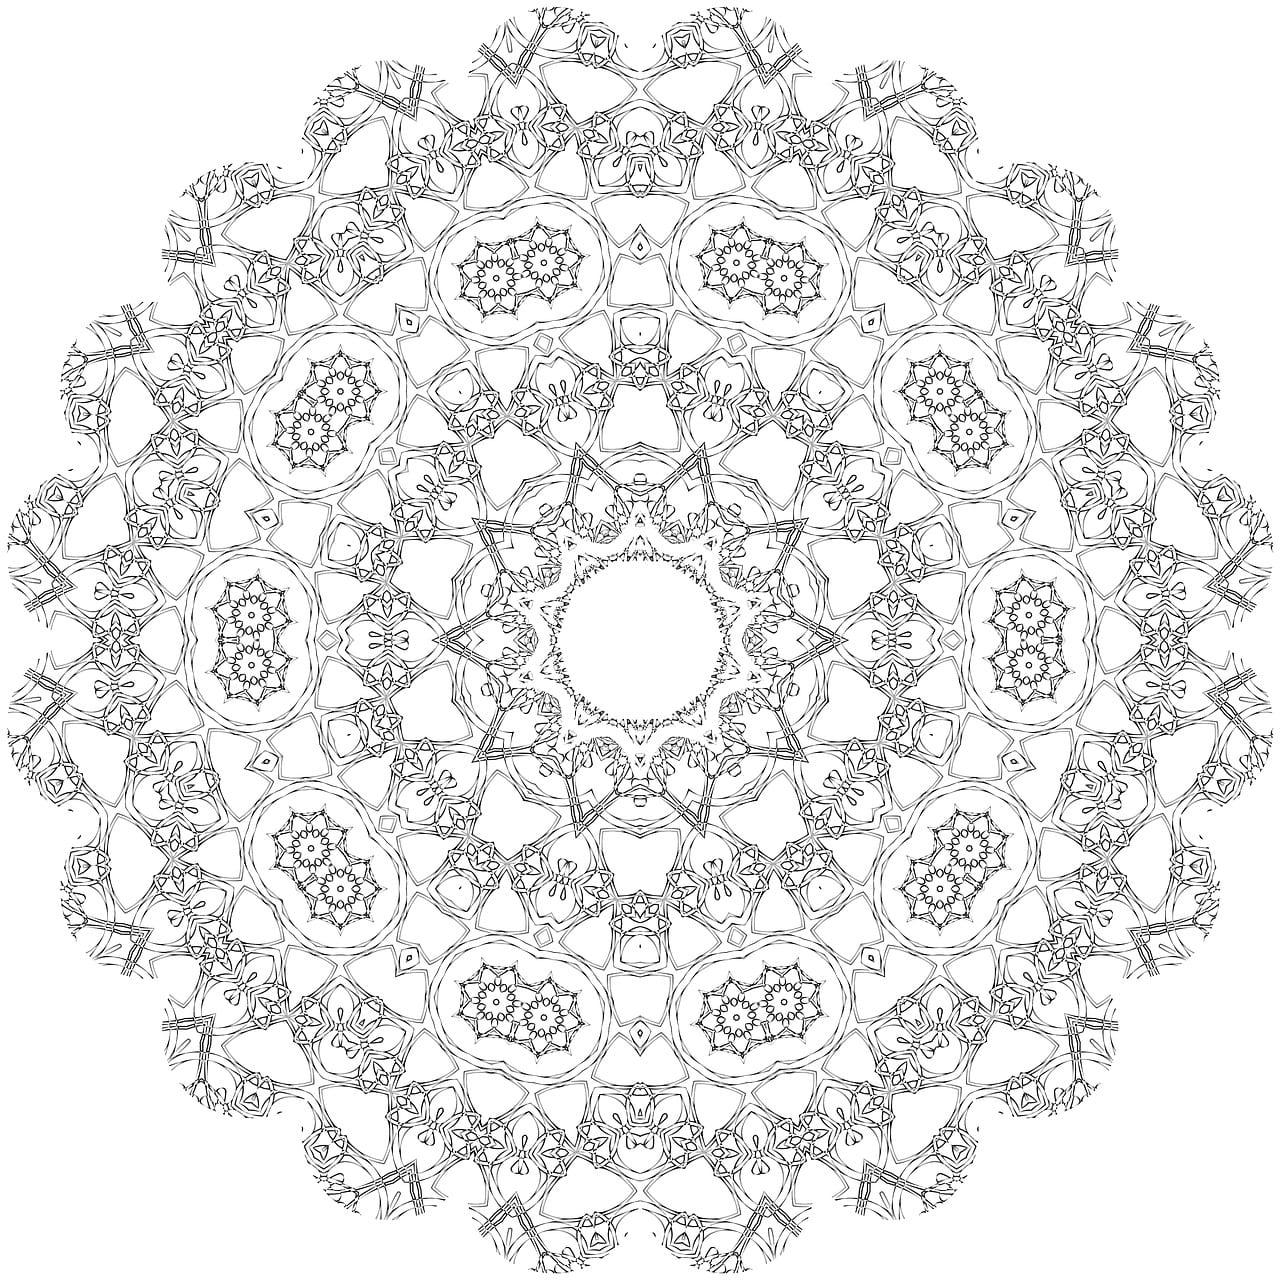 coloring-mandalas-2115758_1280